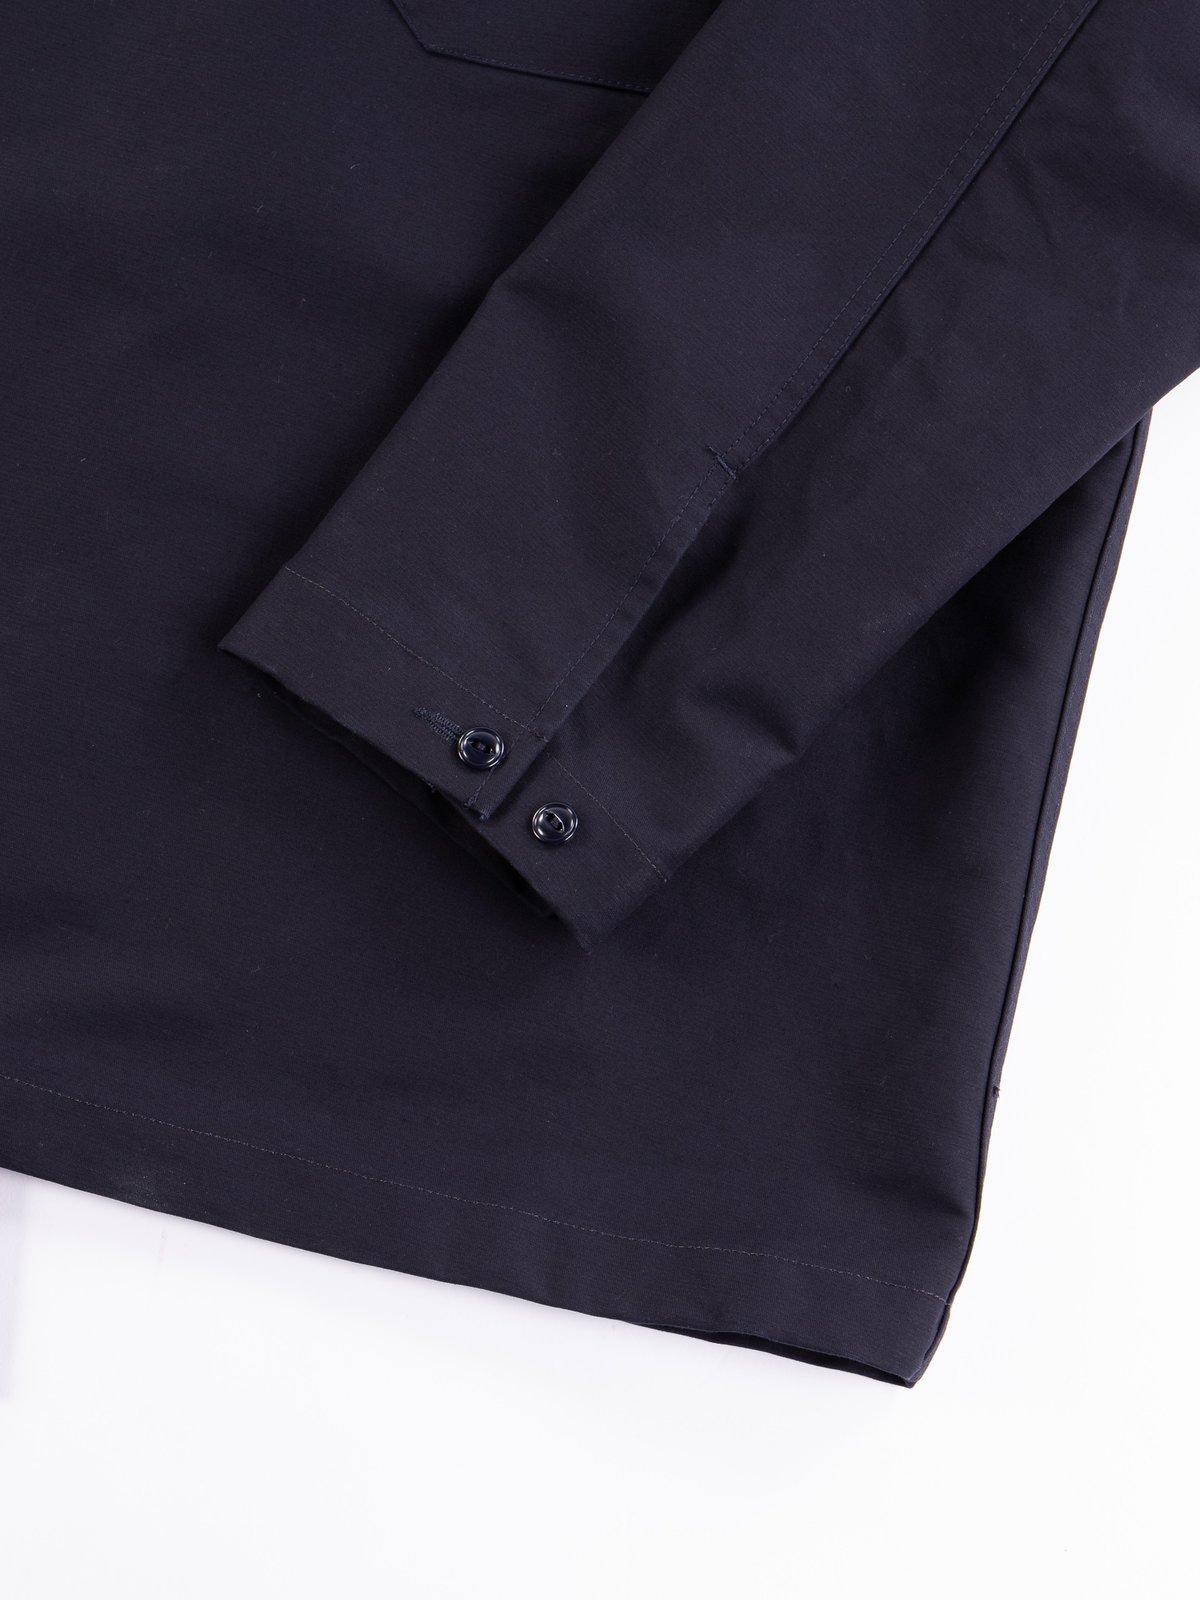 Navy Cotton Double Cloth Cagoule Shirt - Image 4